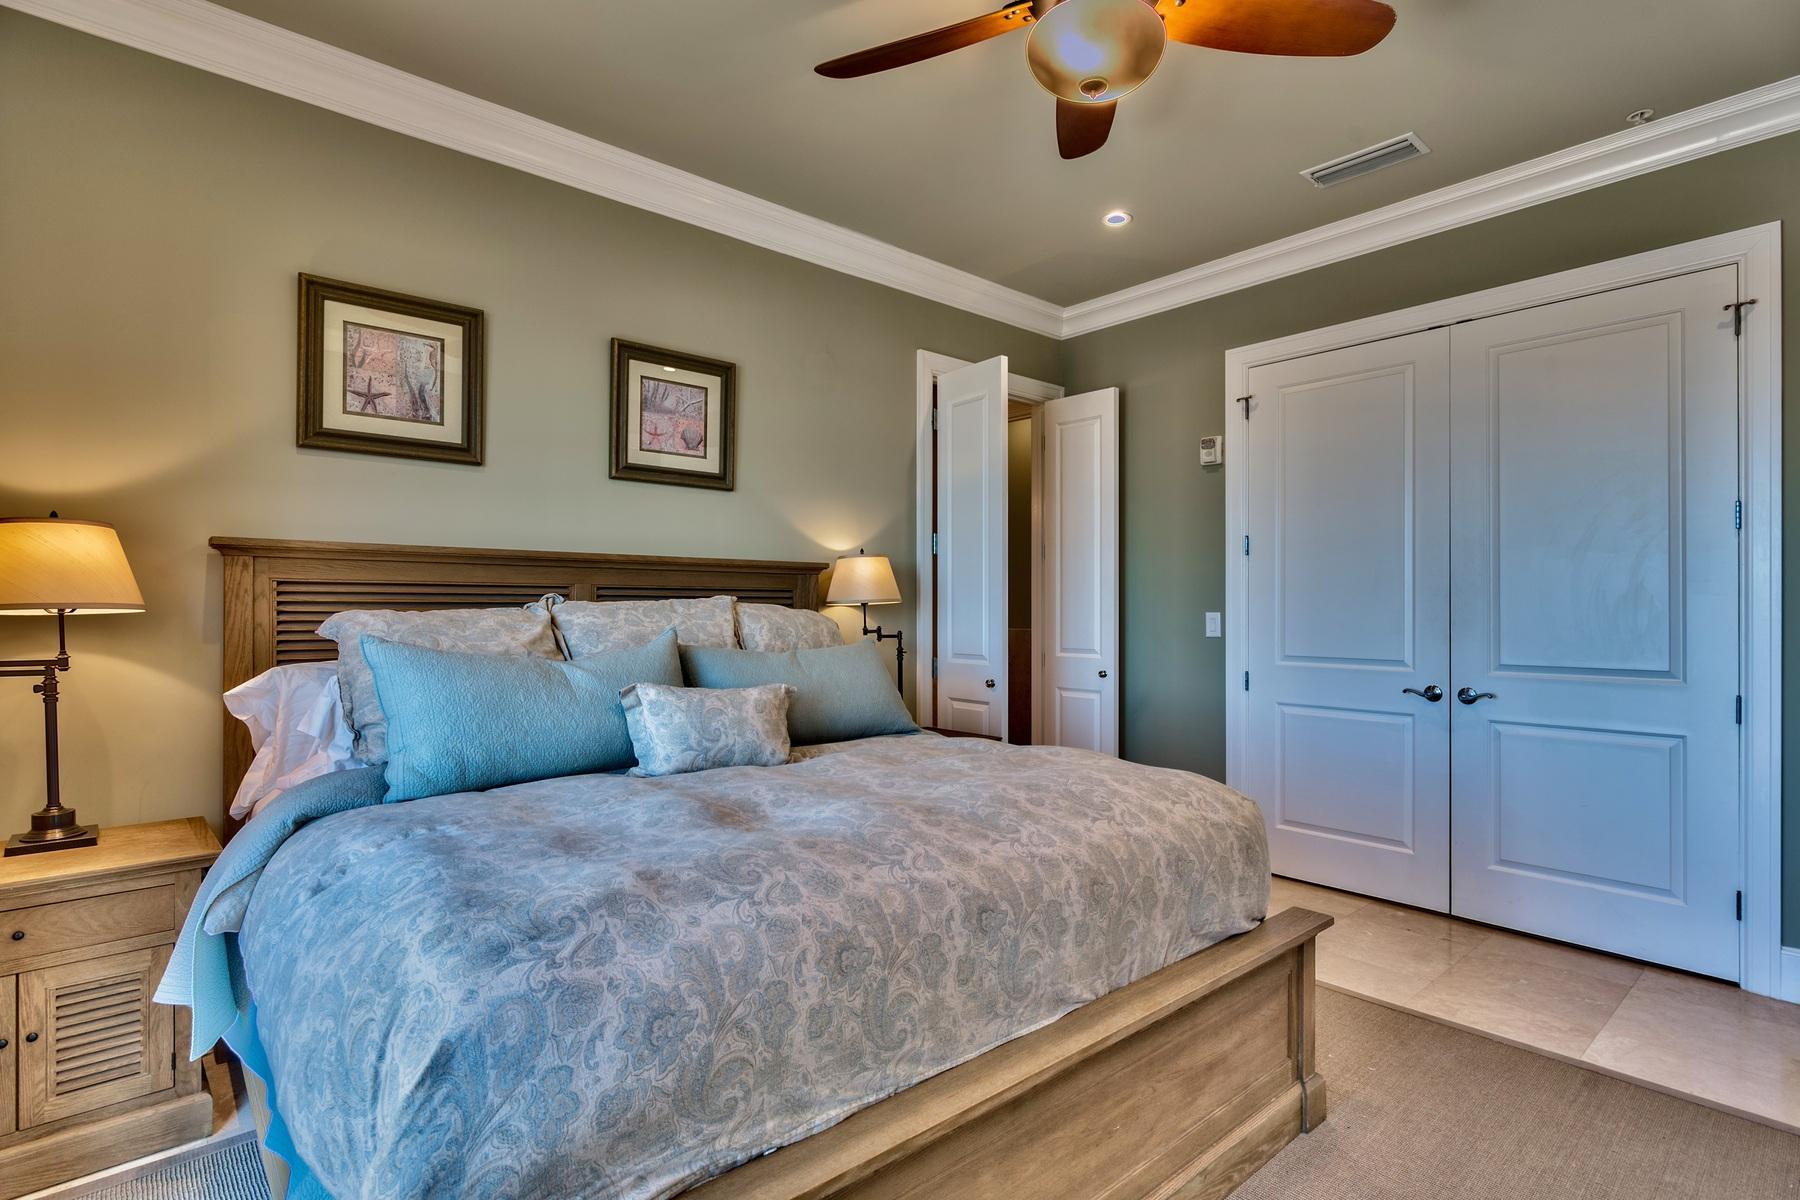 1363 Co Highway 30-A,Santa Rosa Beach,Florida 32459,4 Bedrooms Bedrooms,4 BathroomsBathrooms,Condominium,Co Highway 30-A,20131126143817002353000000